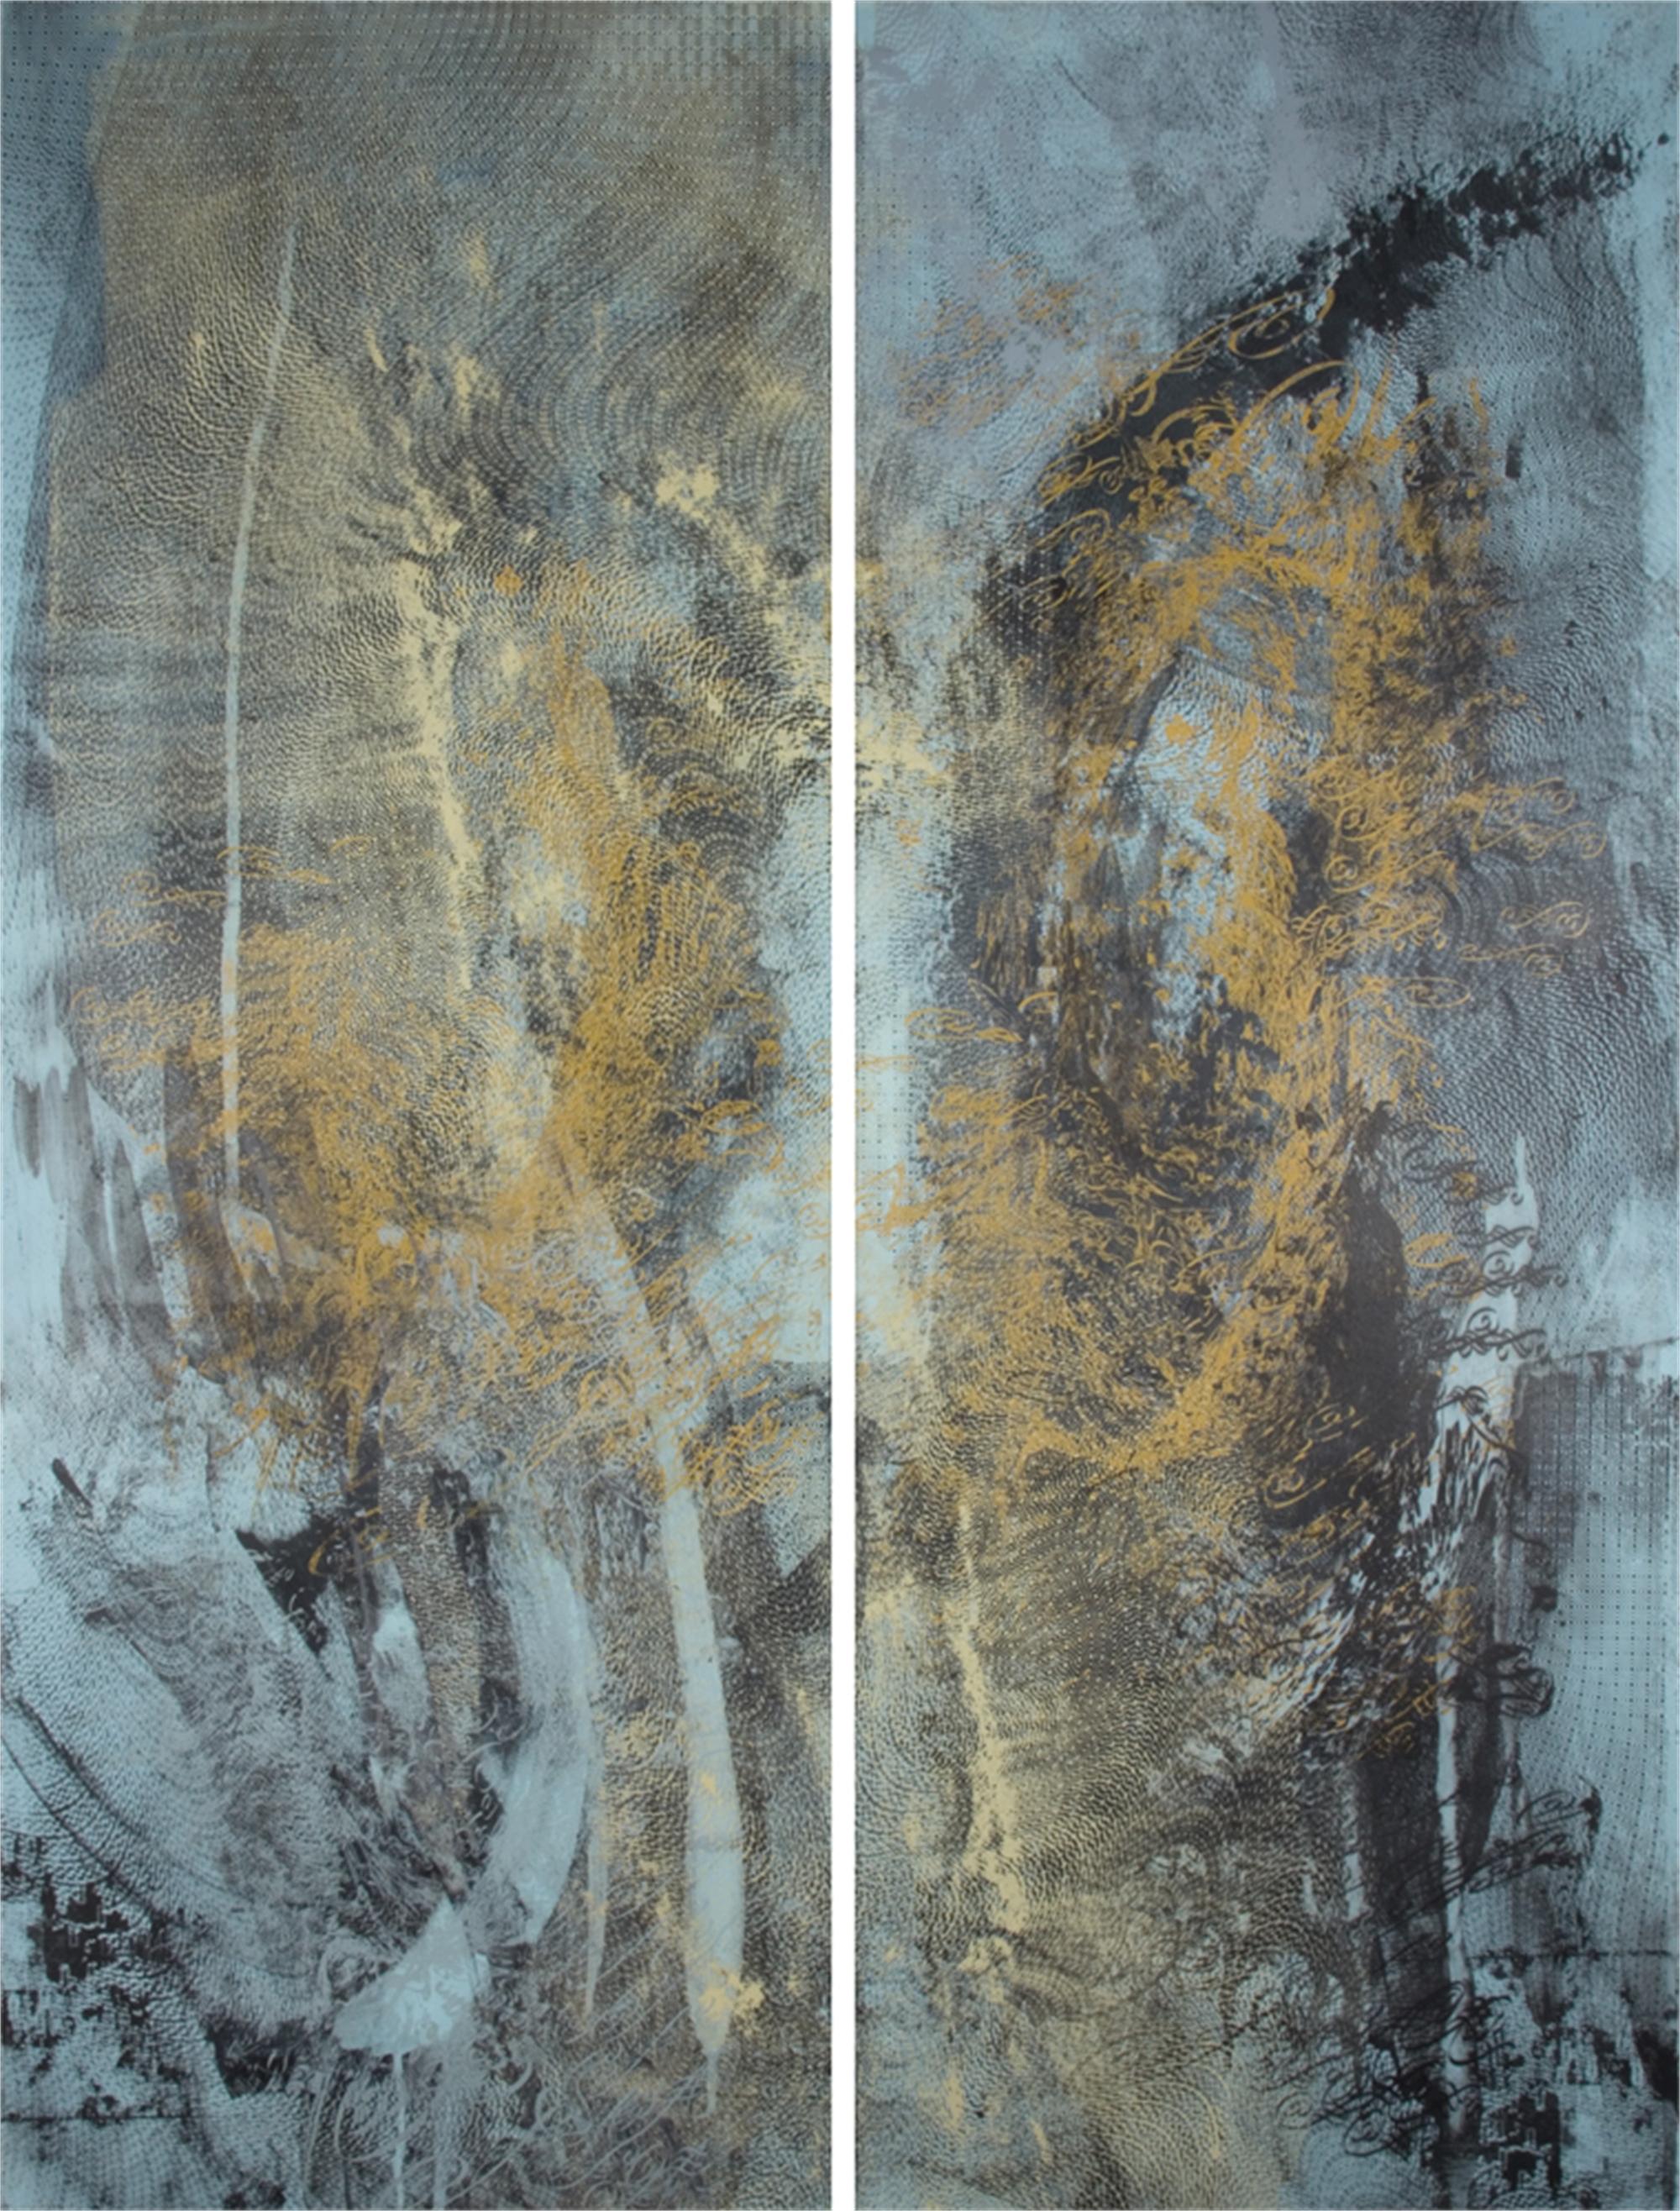 Entangled 8 by Dorothea Van Camp